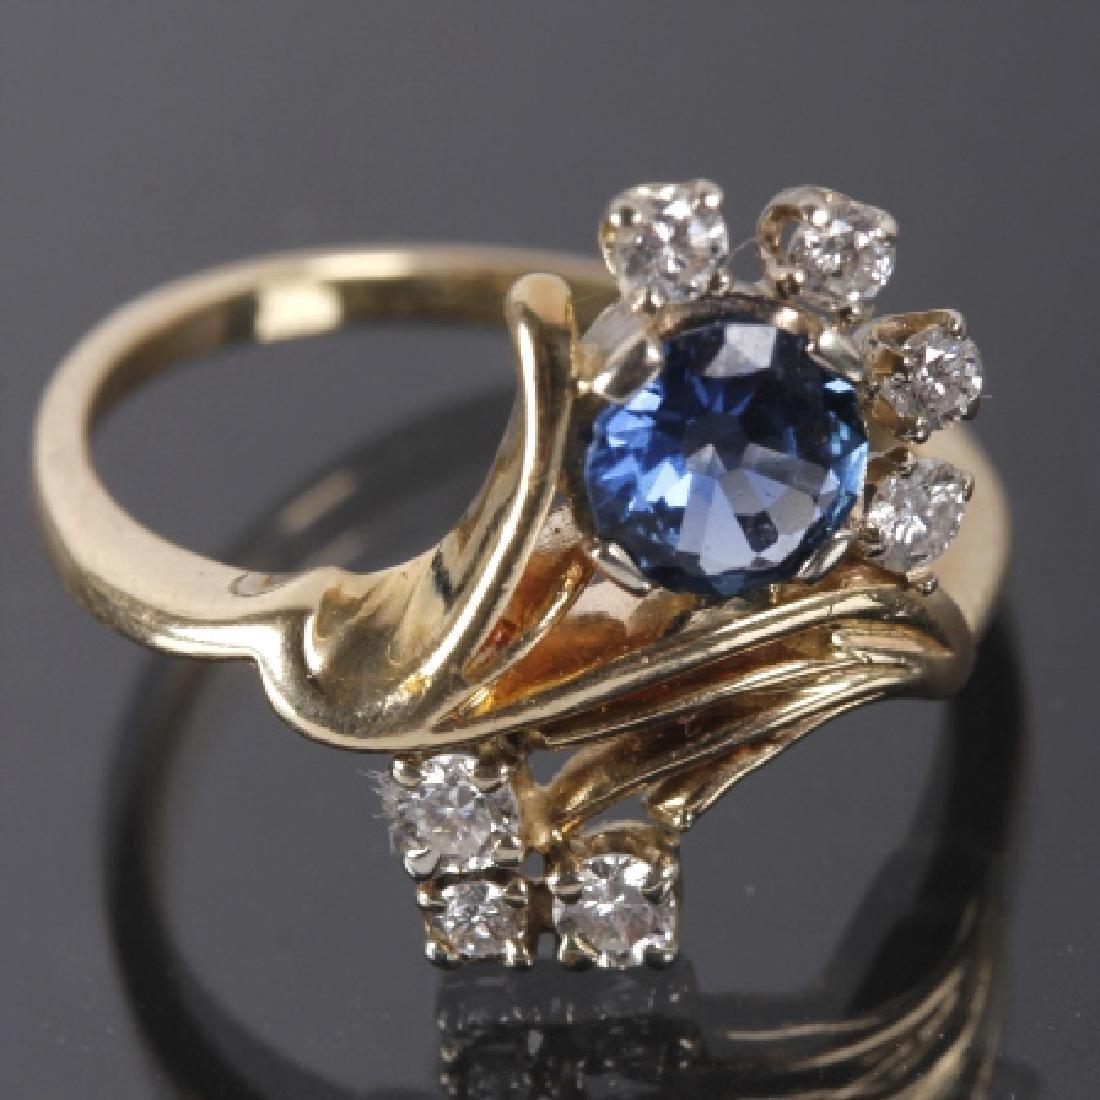 14K Gold Montana Yogo Sapphire & Diamond Ring